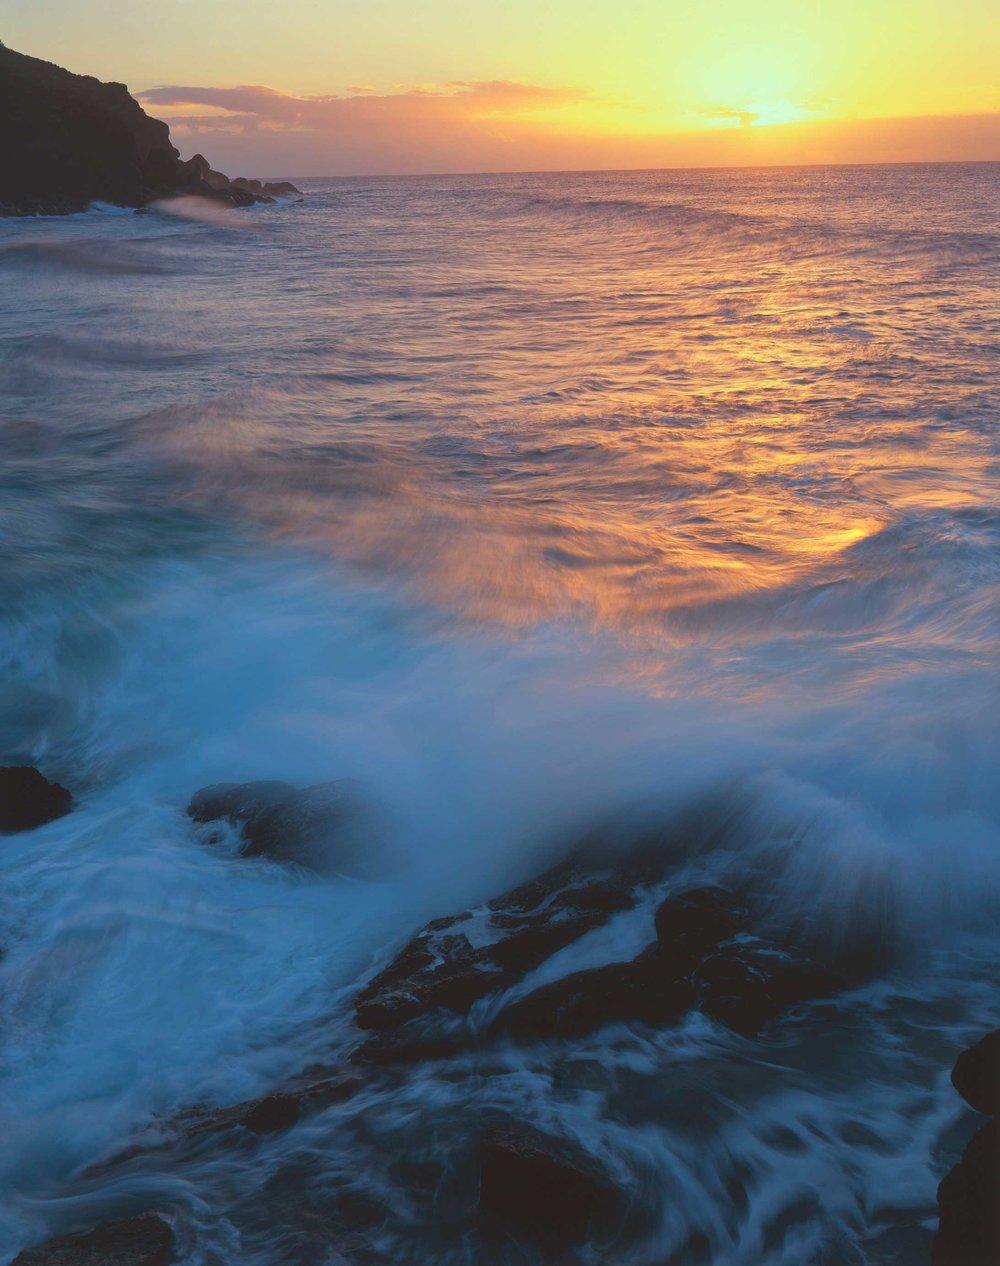 sunrise-janies-corner.jpg